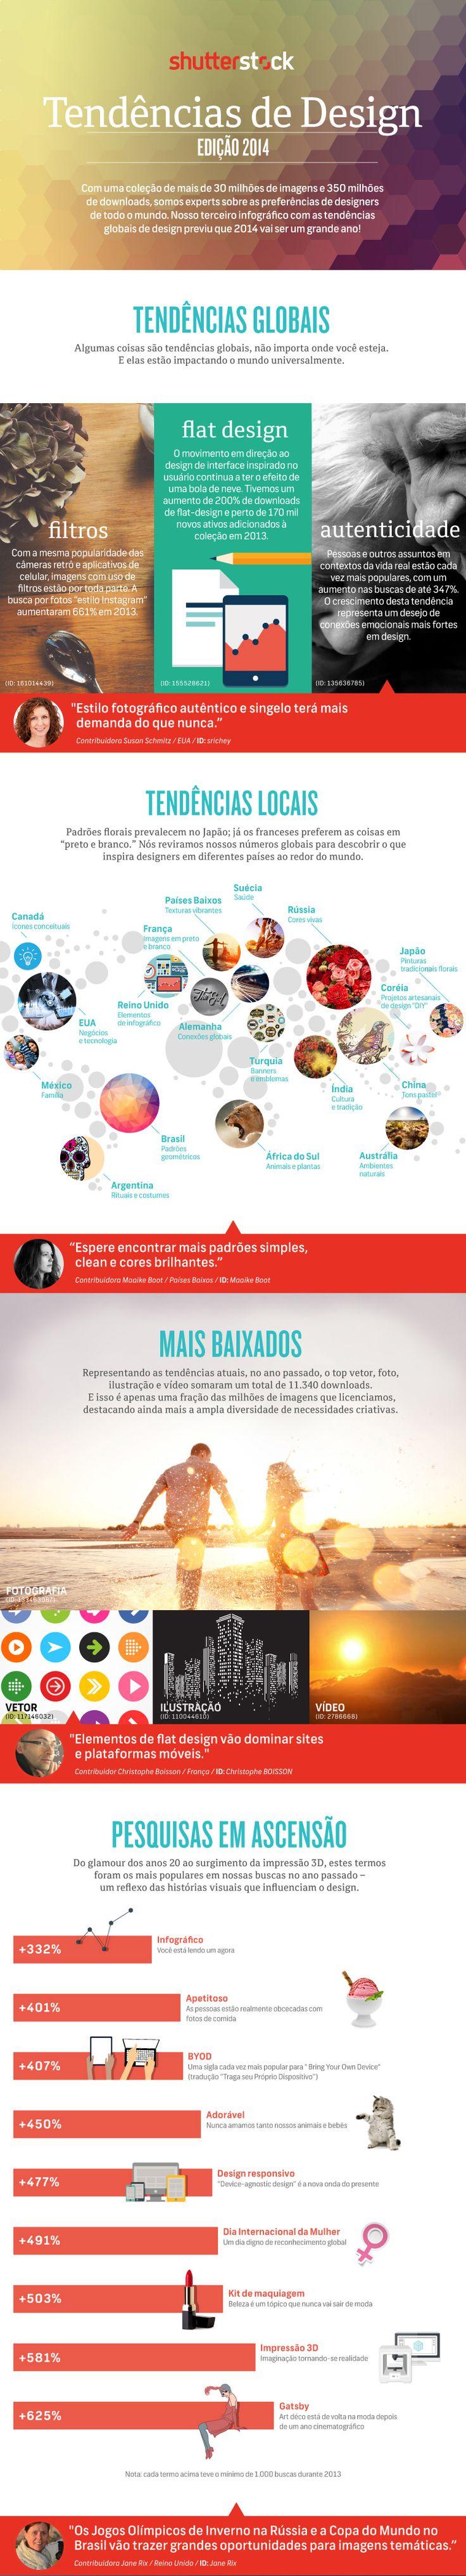 2014-Infographic-parte-1